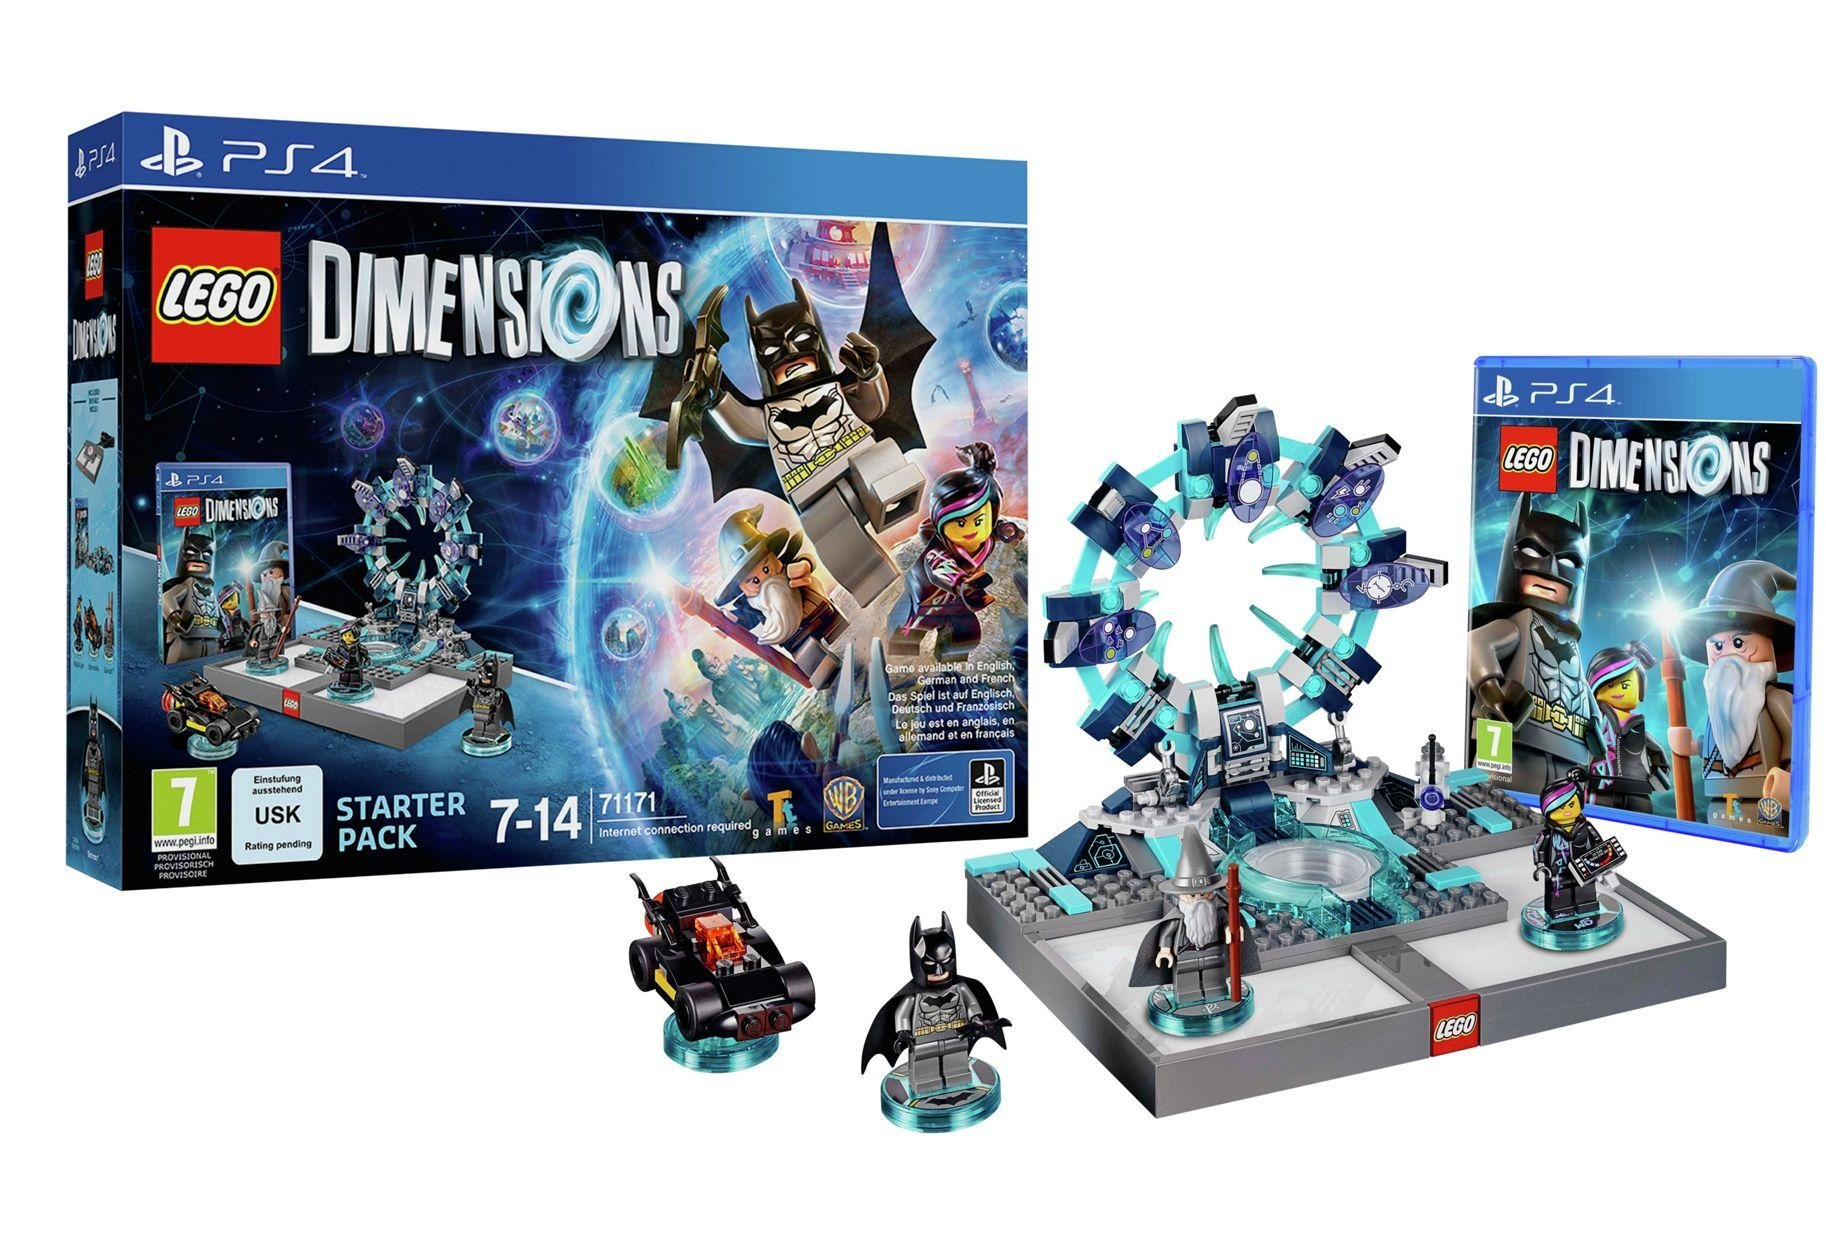 LEGO - Dimensions Starter Pack - Playstation 4.